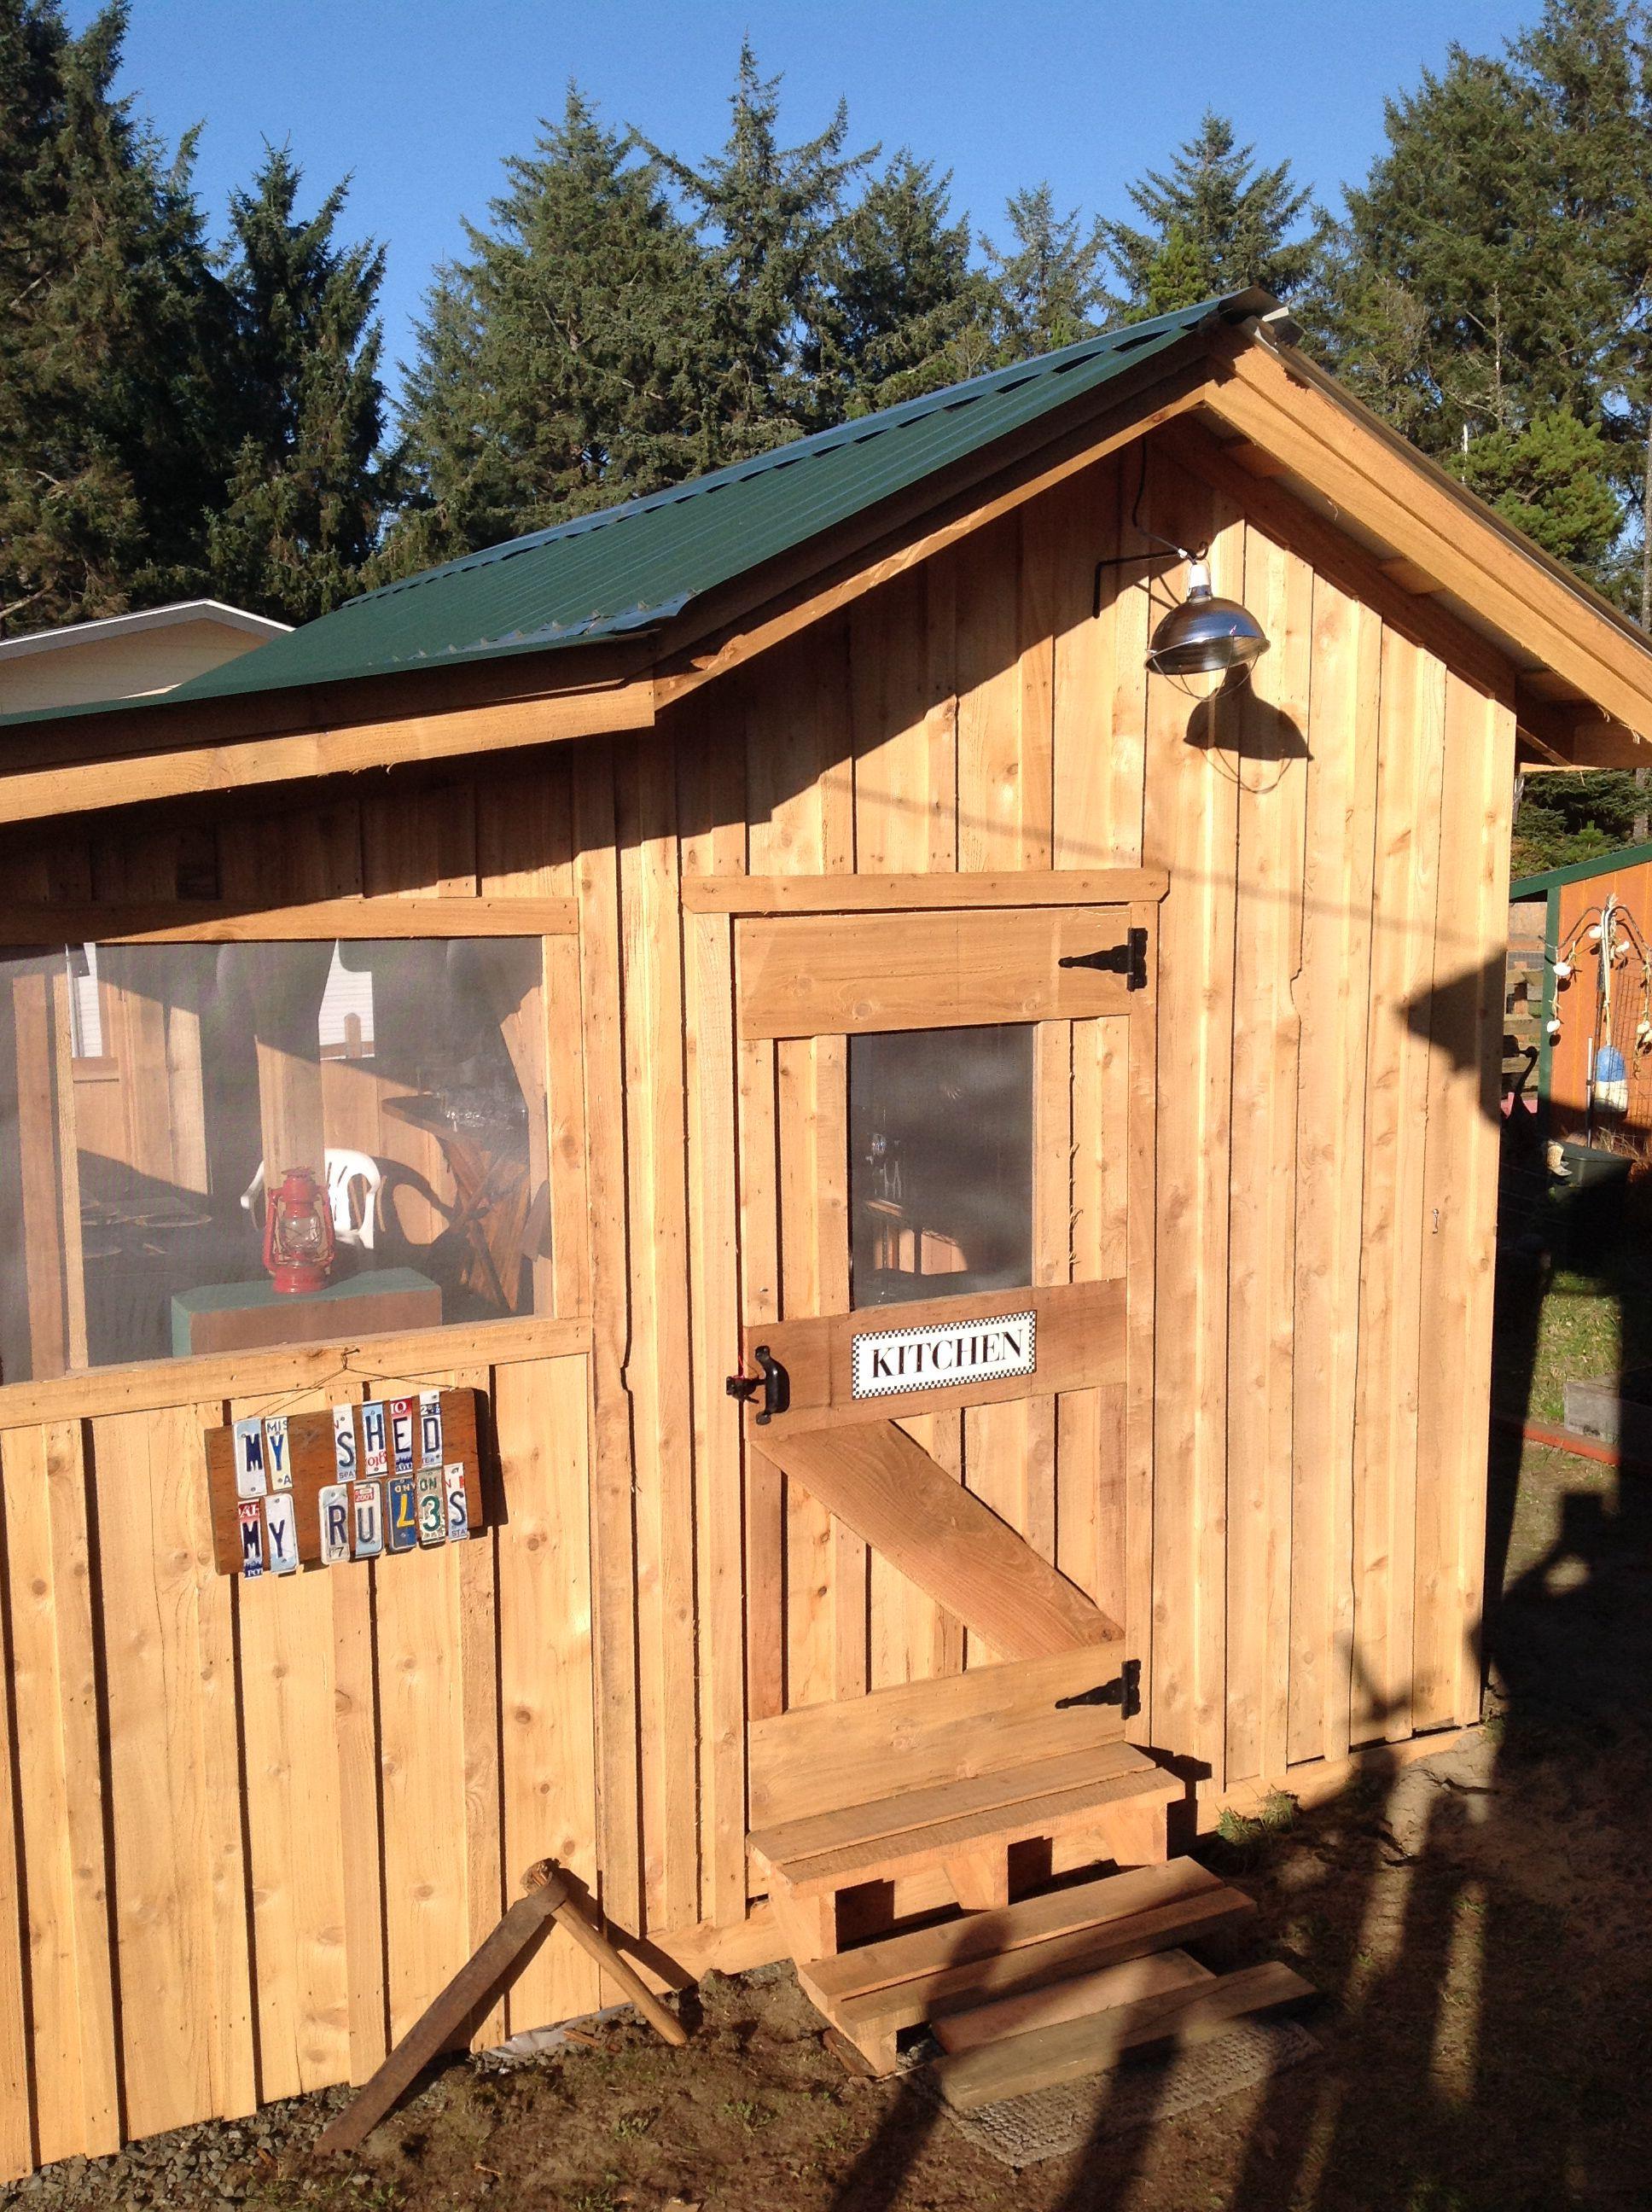 Backyard clubhouse   Backyard, Backyard for kids, Rustic deck